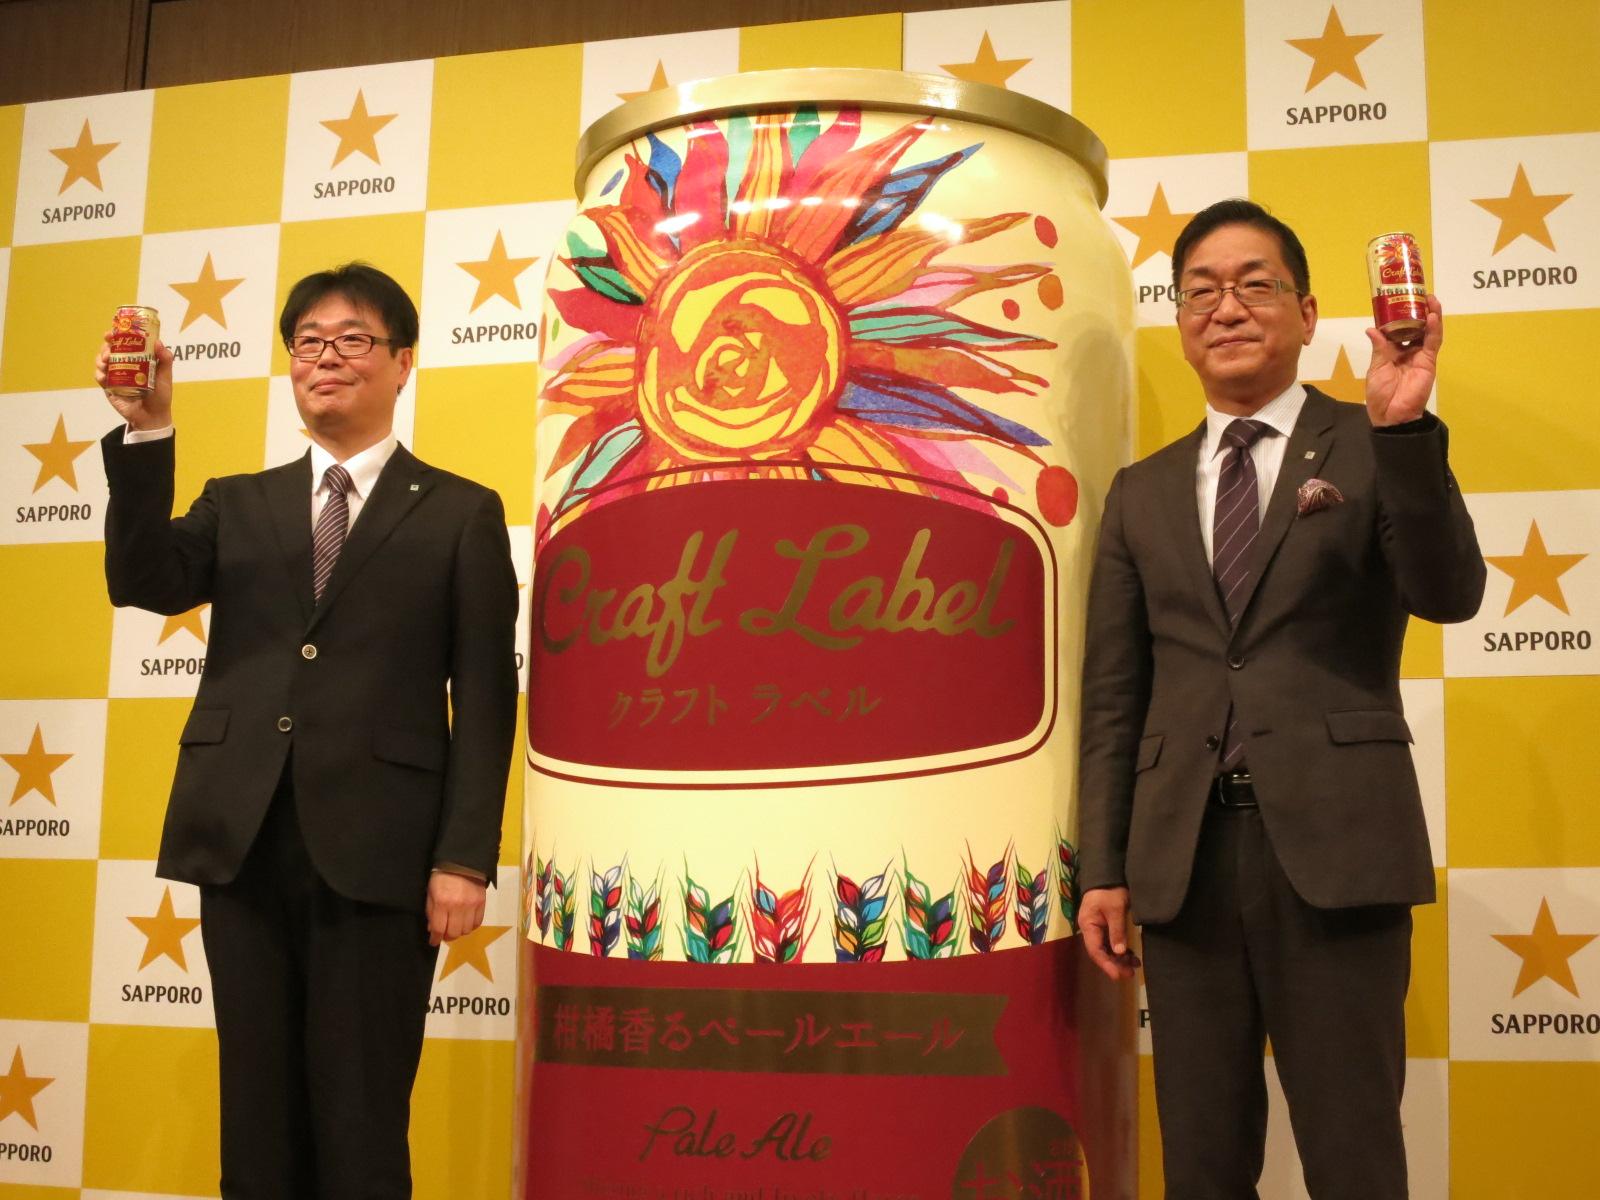 La brasserie Sapporo va se lancer dans la bière artisanale